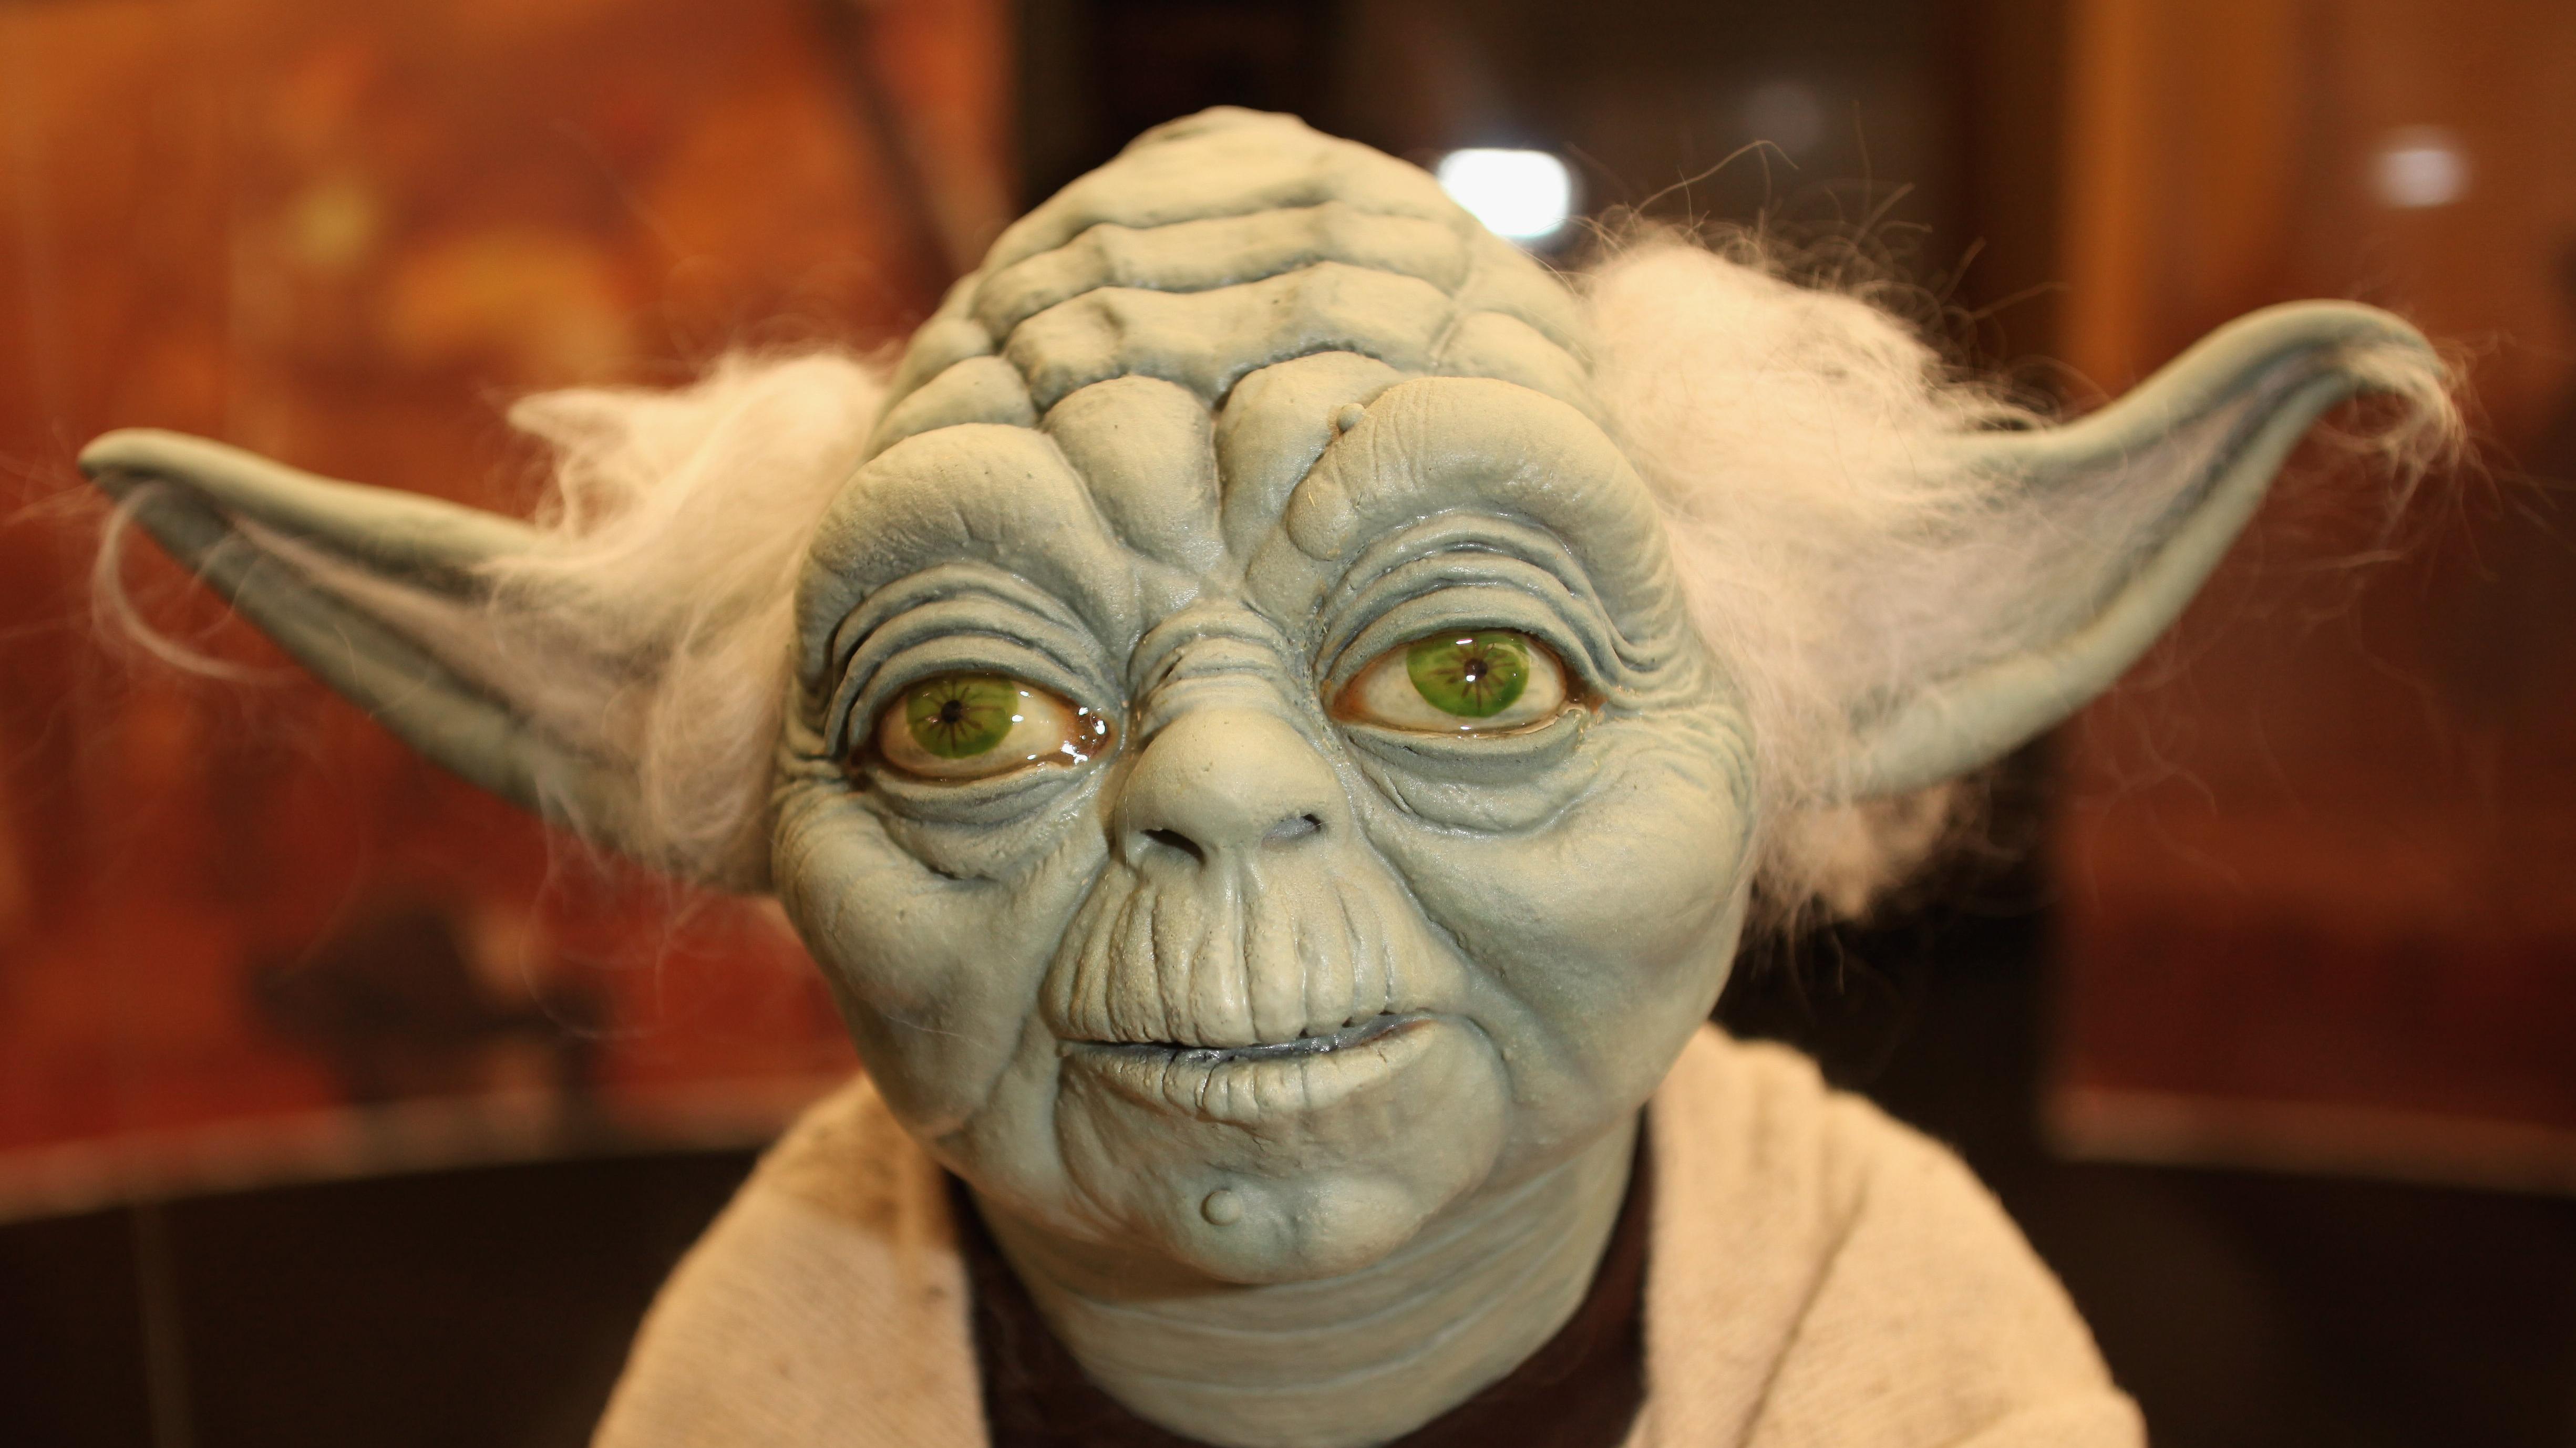 Famous Star Wars makeup artist Stuart Freeborn 07.02.2013 died 39